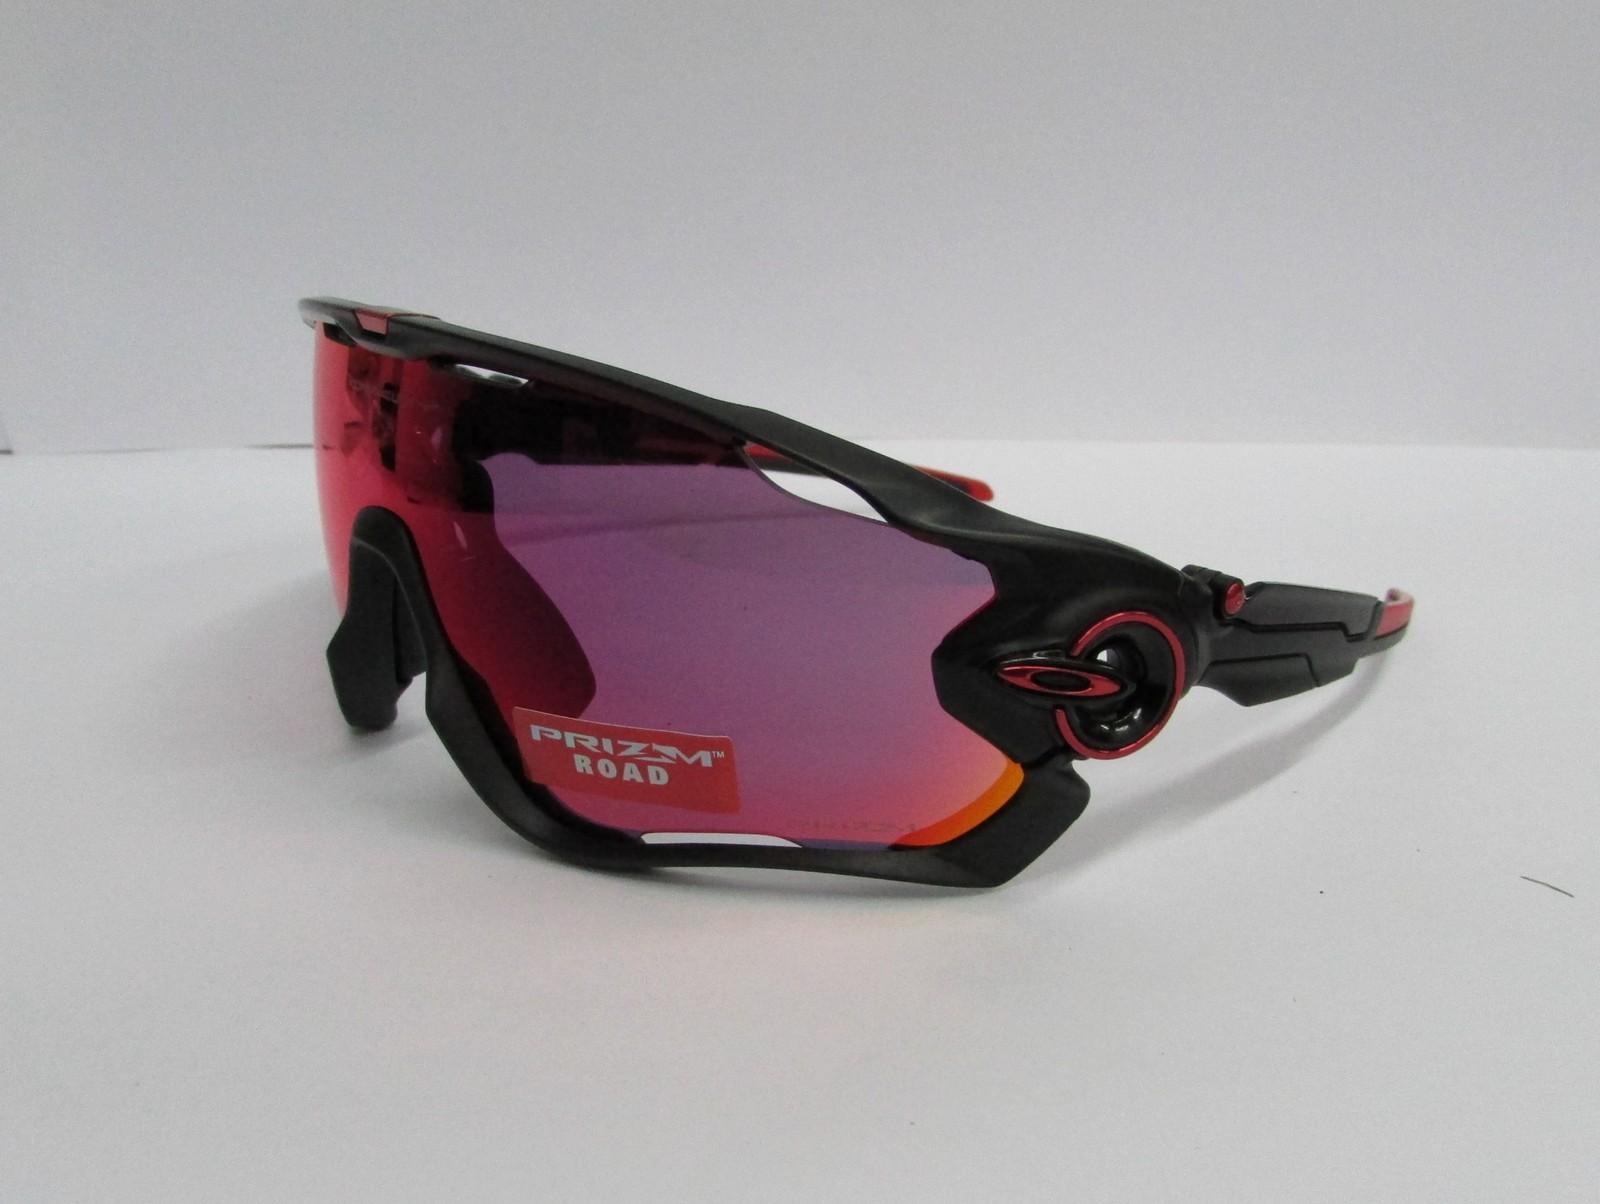 e114a9ed477 low cost ray ban wayfarer optical for sale d553f 8c2ba  spain oakley  sunglasses 9290 20 jawbreaker prizm and 18 similar items 582ab c7aaa